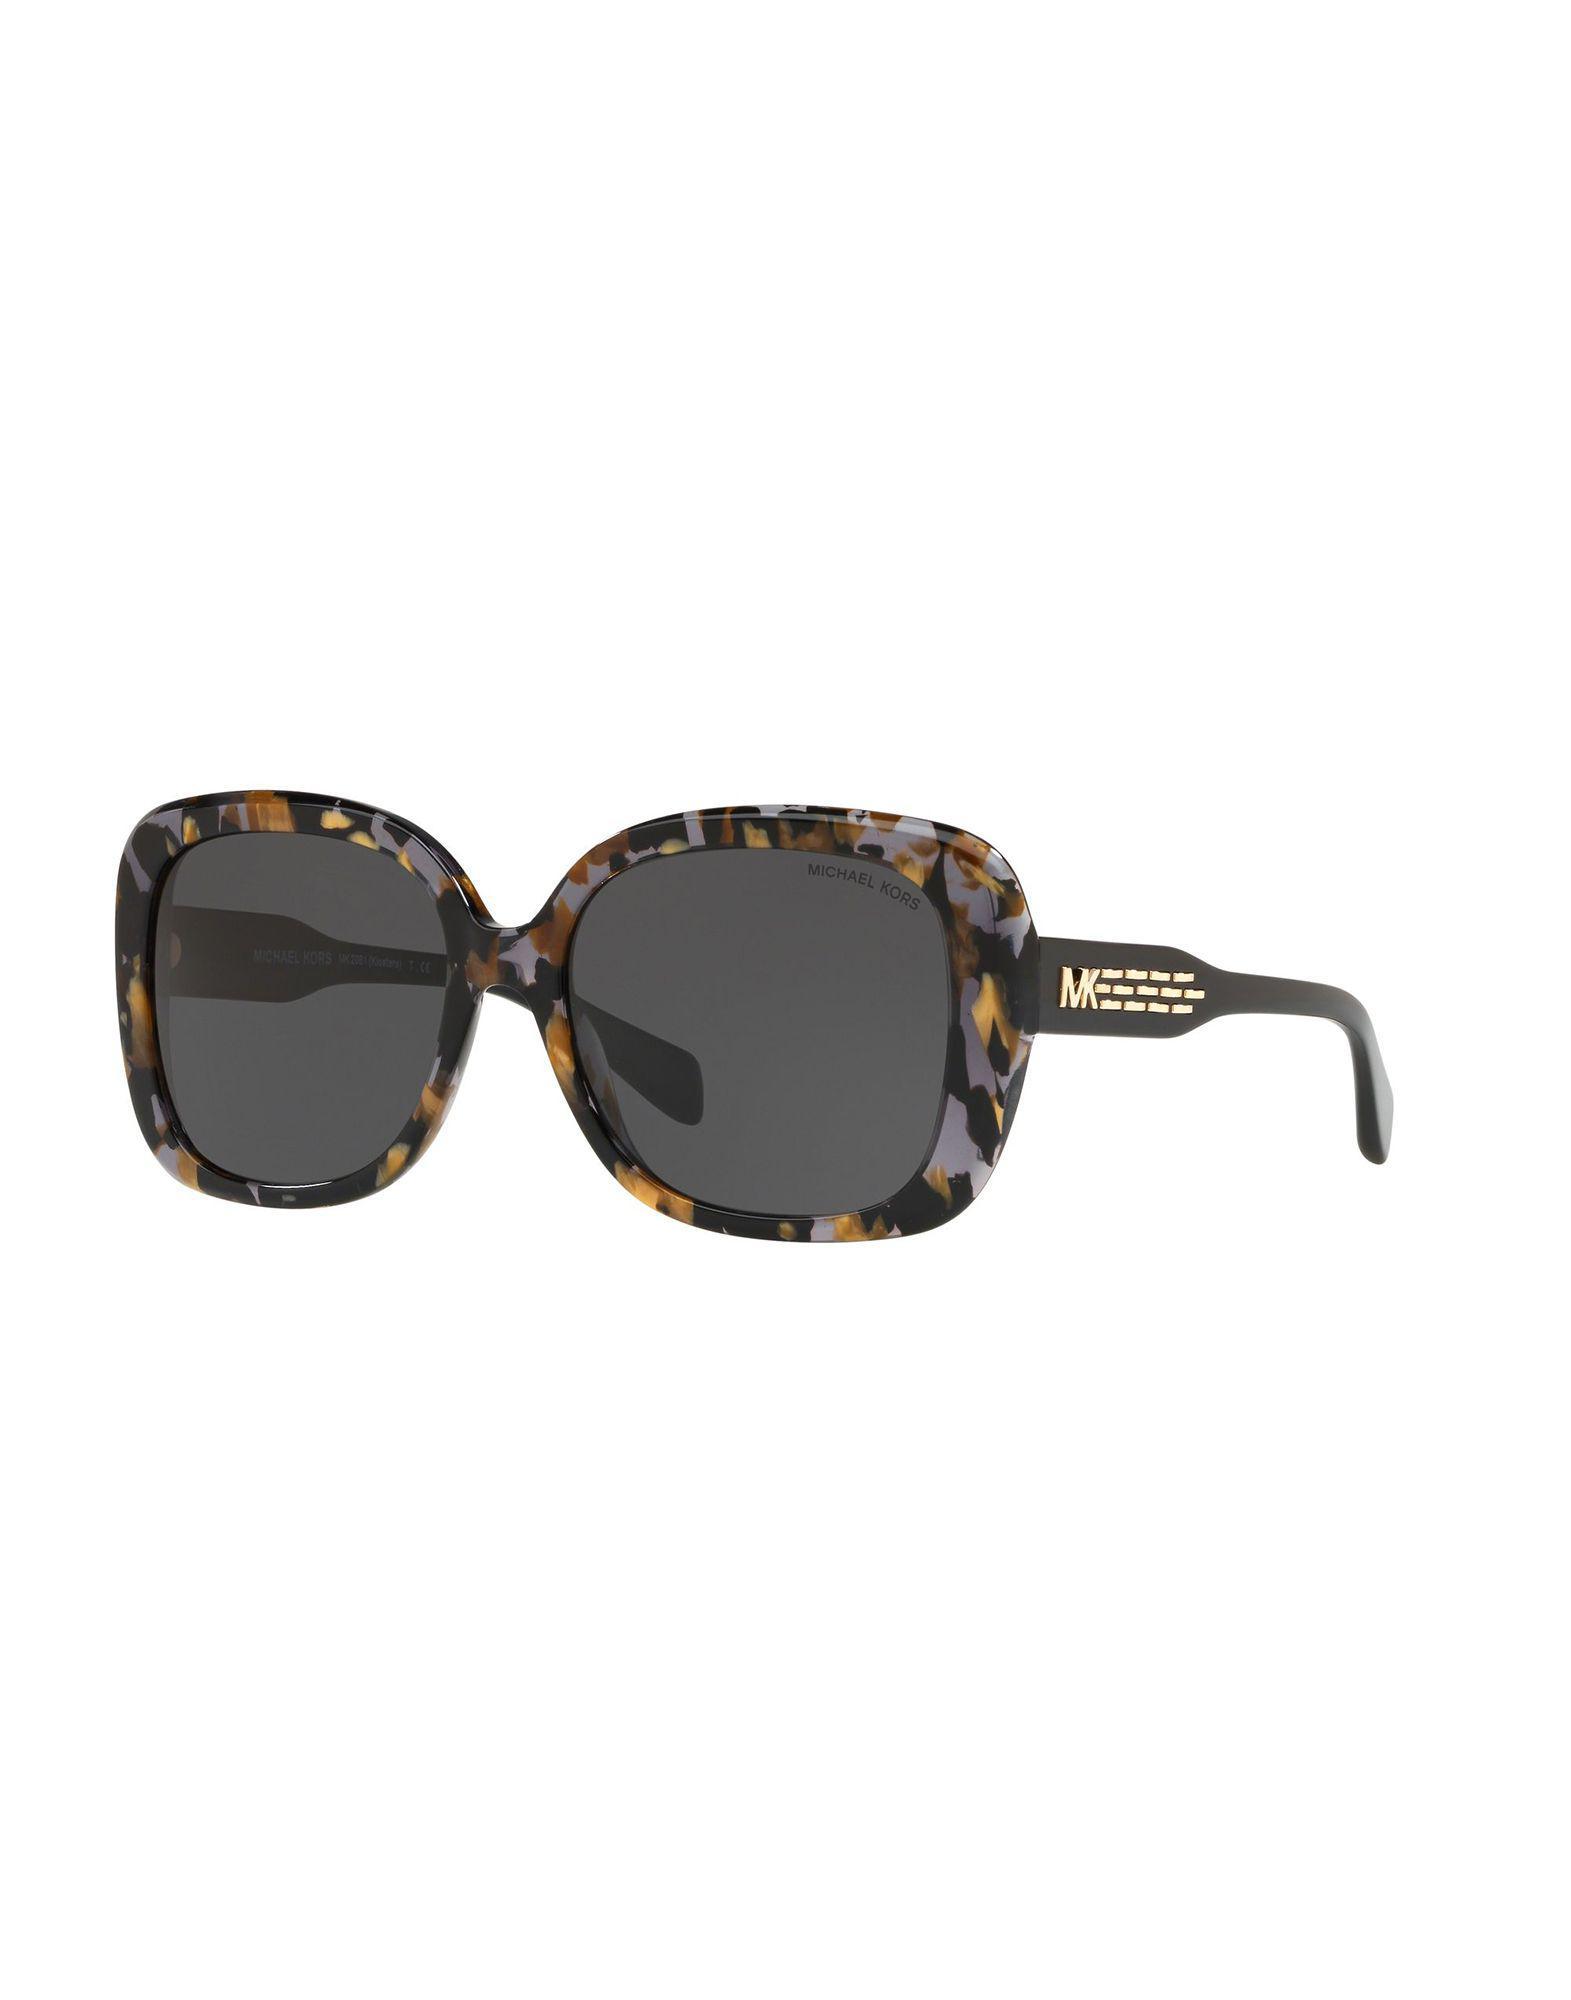 97414964d45 Michael Kors - Black Sunglasses - Lyst. View fullscreen